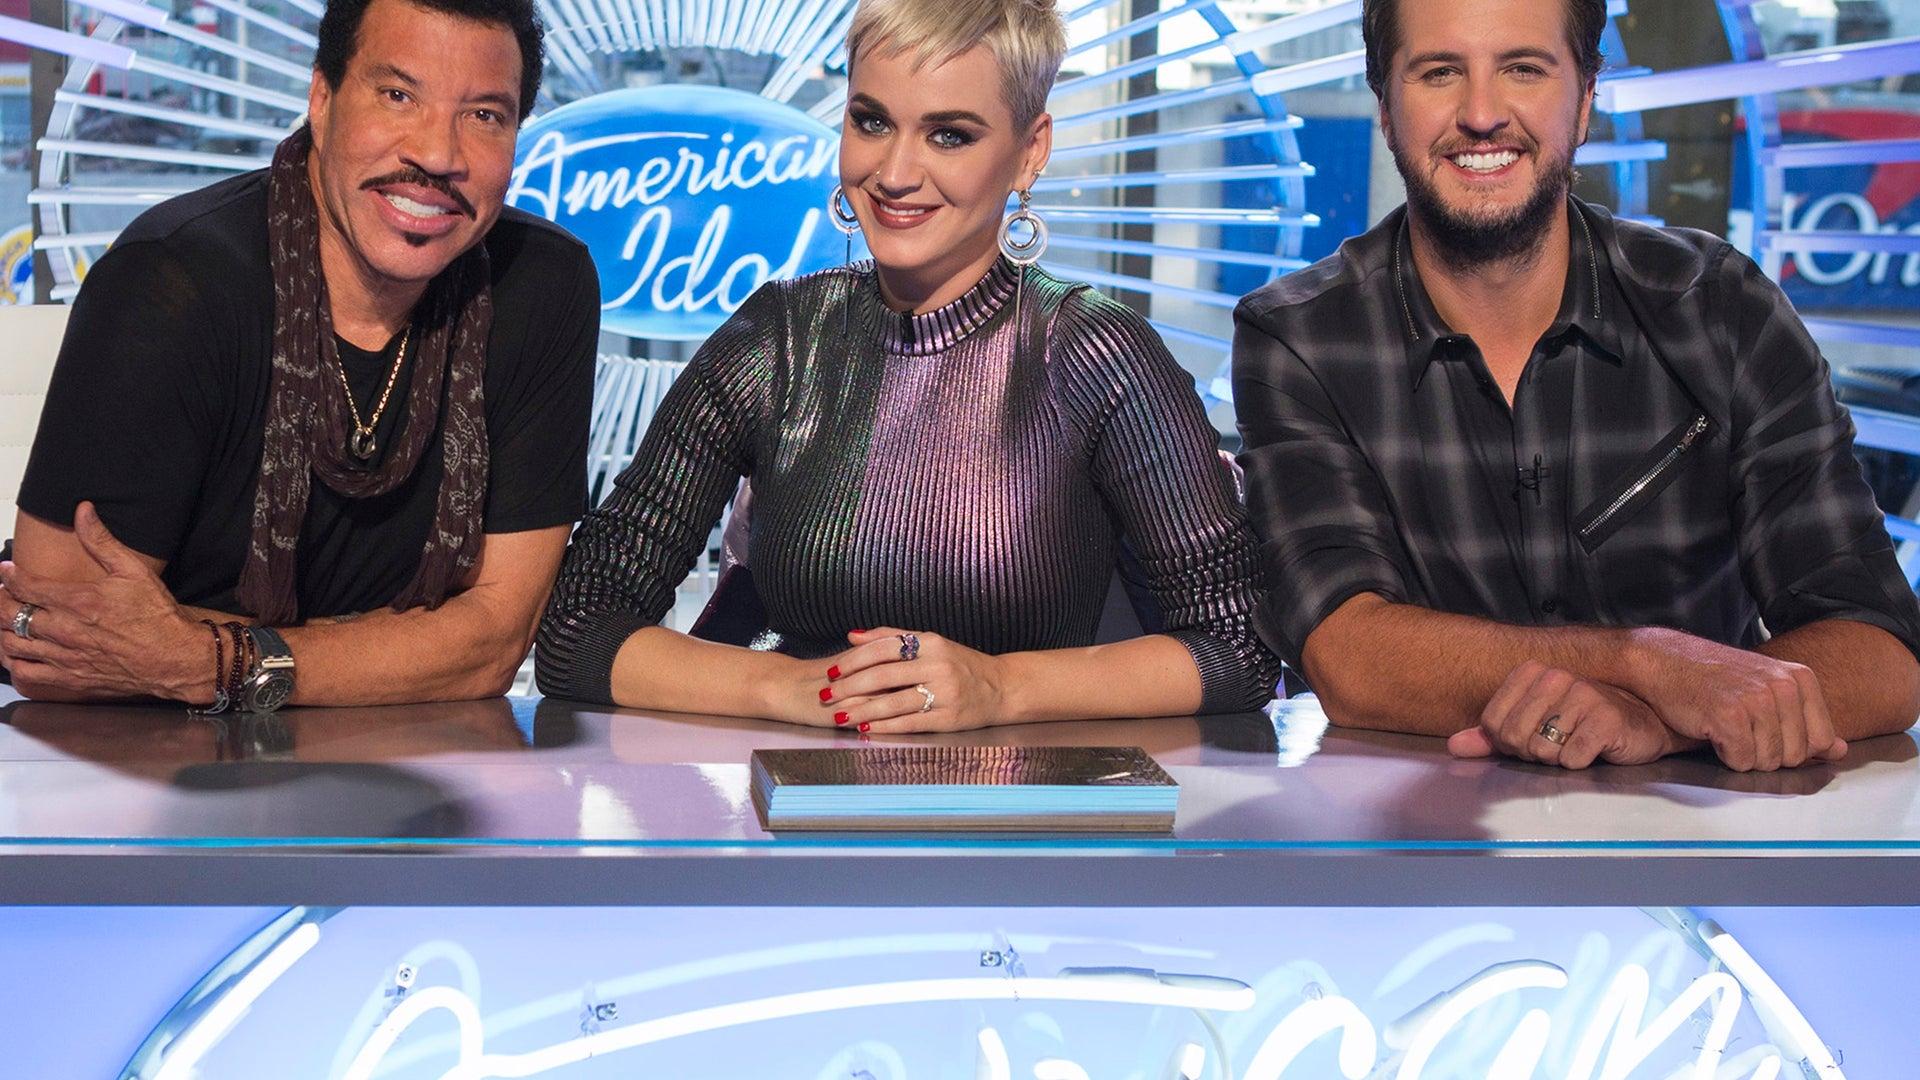 Lionel Richie, Katy Perry, Luke Bryan, American Idol